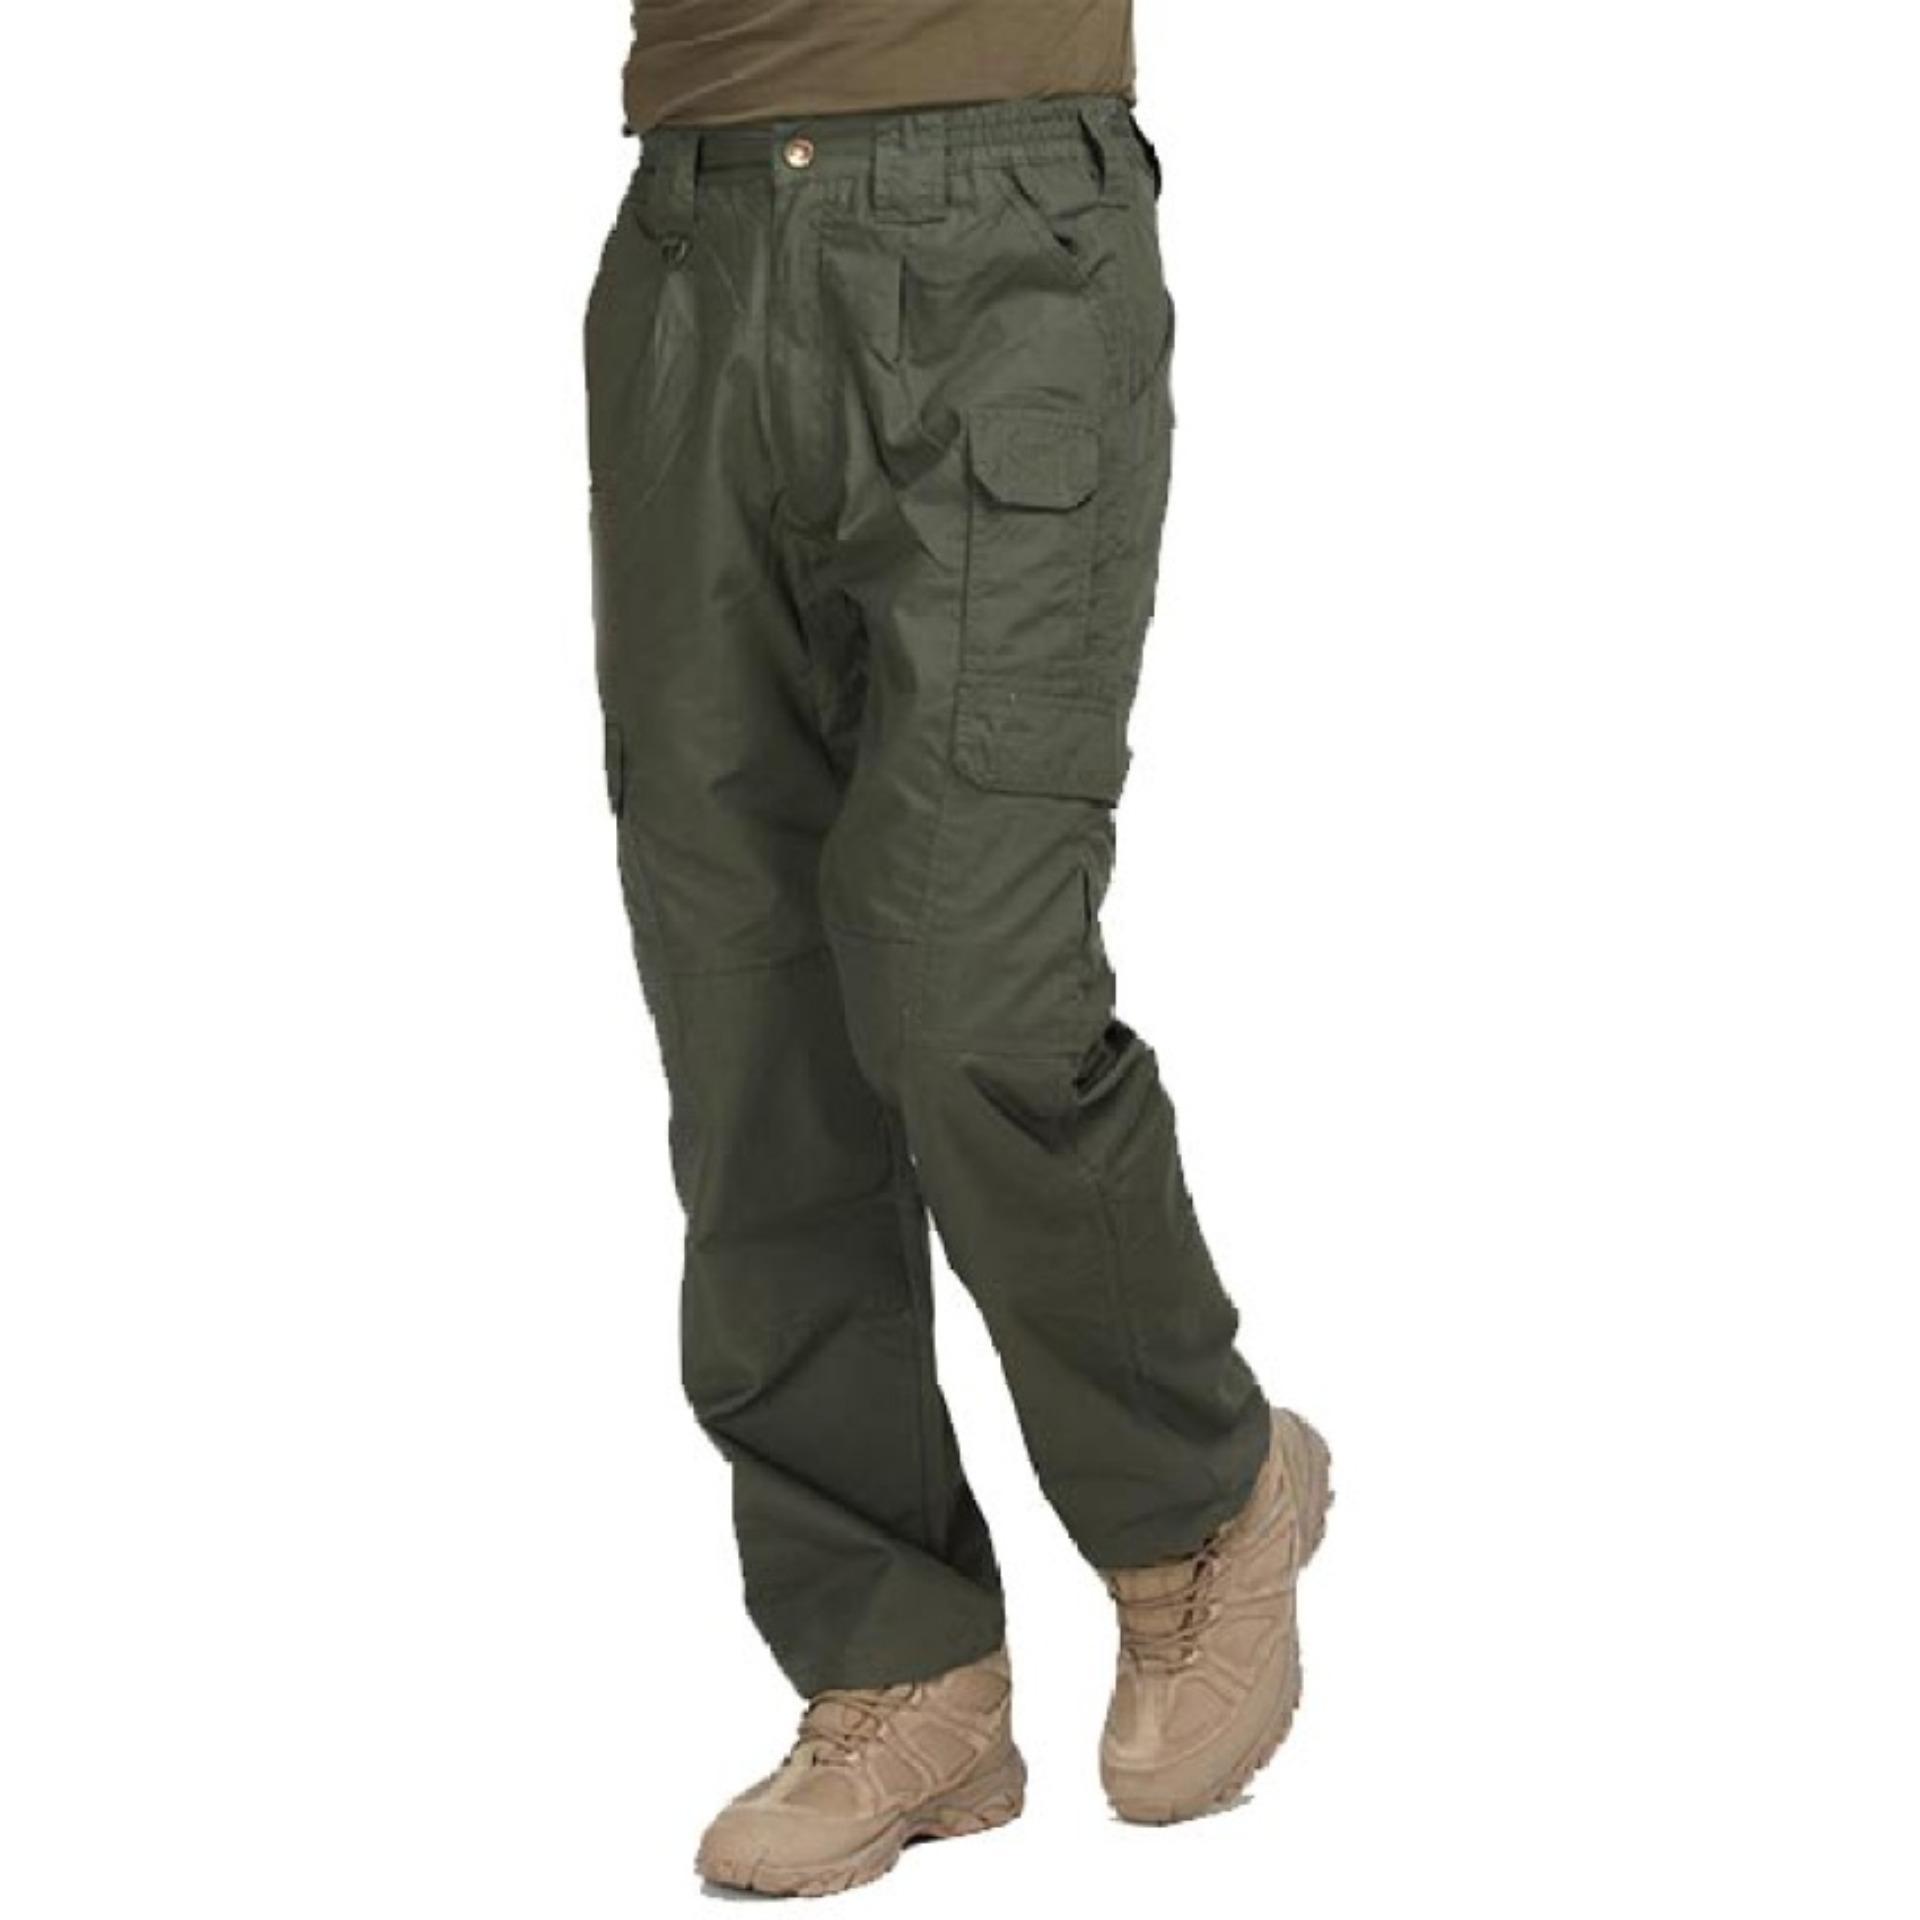 Beli 511 Celana Tactical 511 Blackhawk Hijau Army 511 Asli